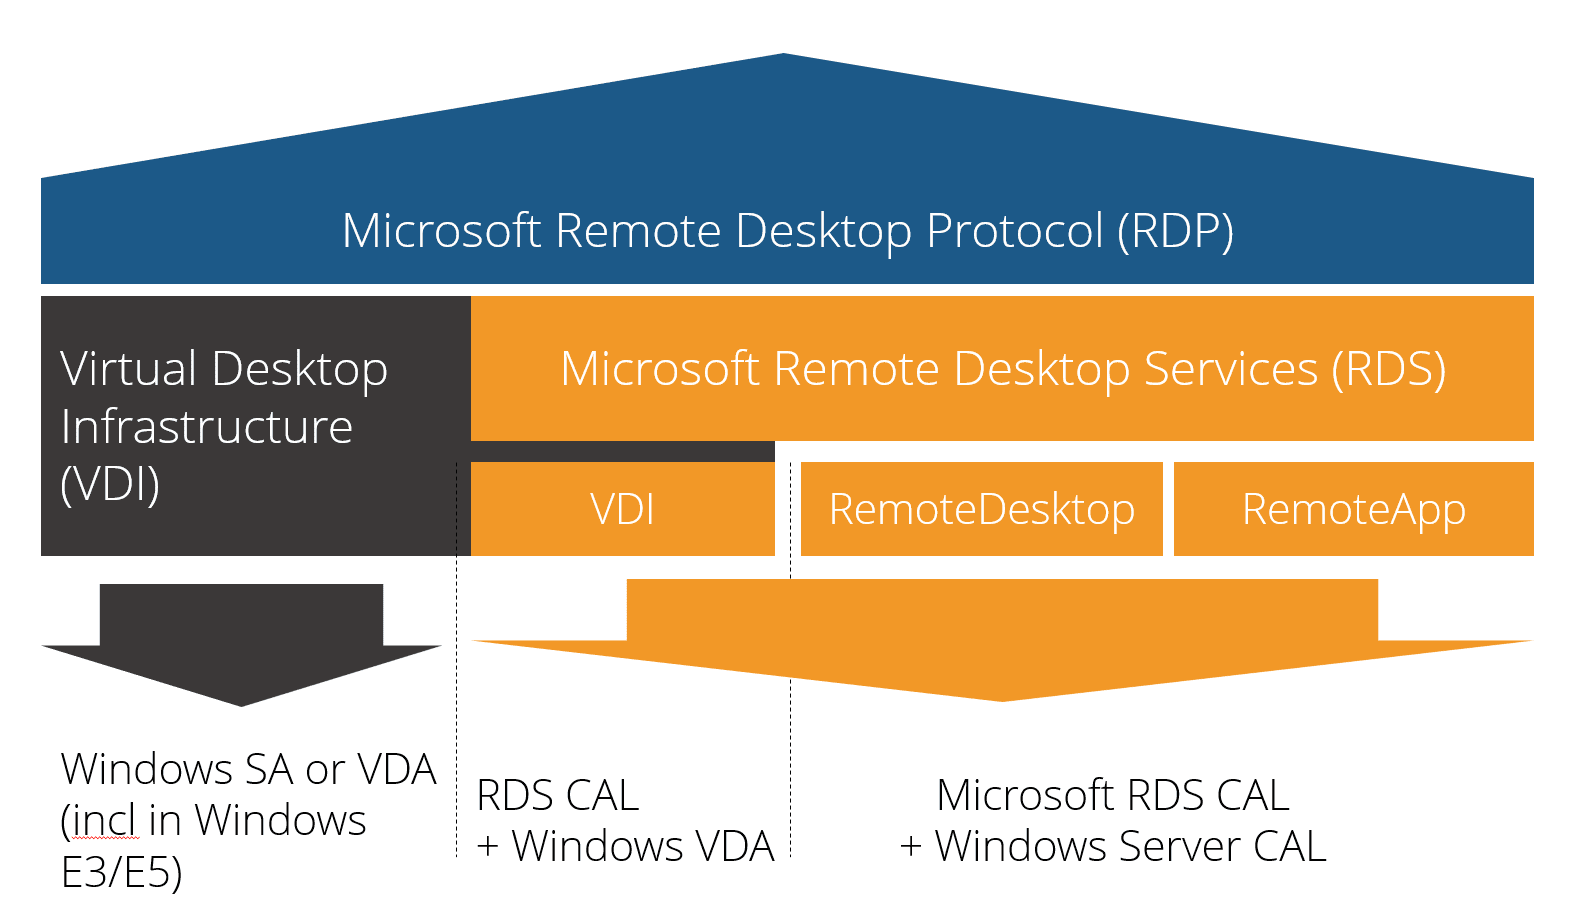 Demystifying RDP pt 2: Understanding Microsoft's RDS & VDI Licensing